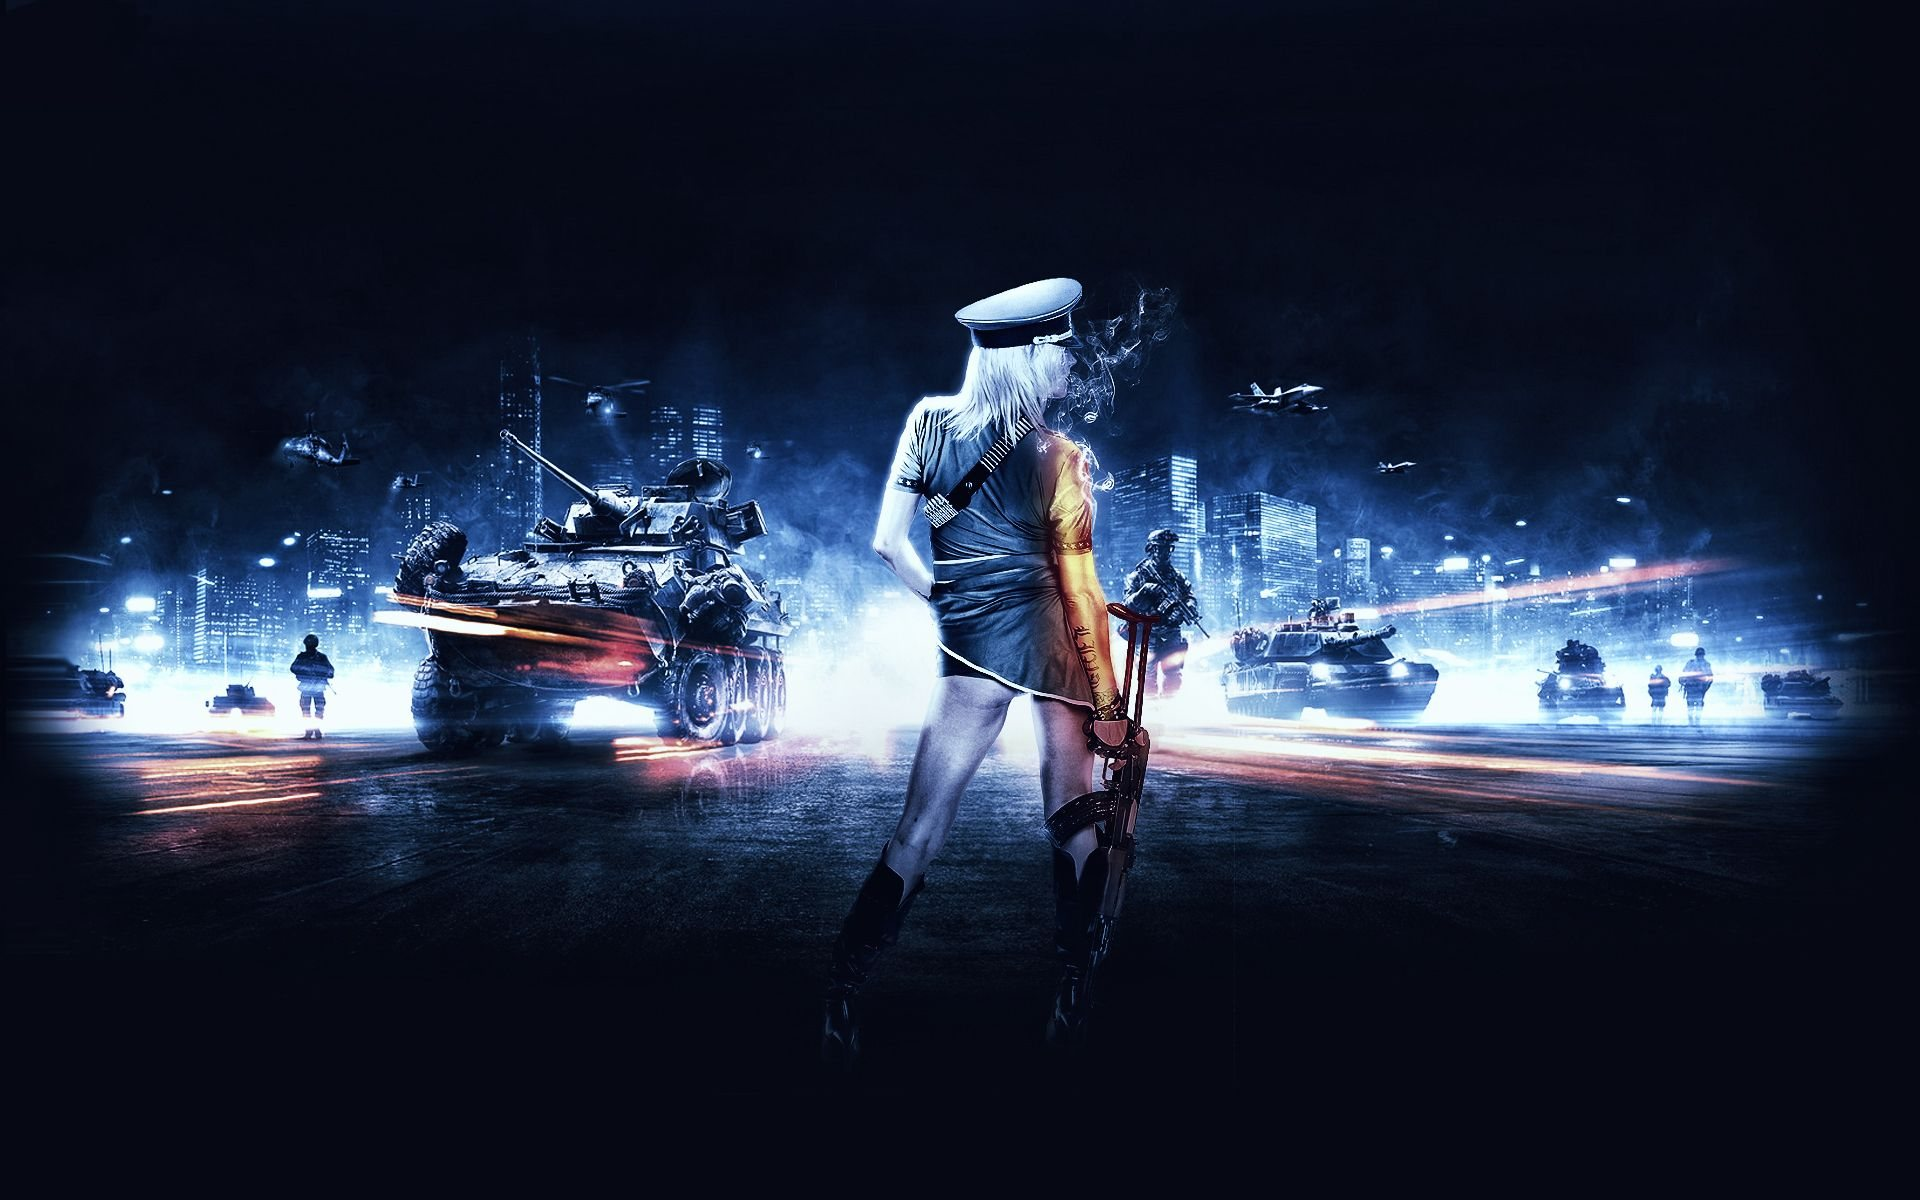 Battlefield 3 Soldier Full HD Desktop Wallpapers 1080p 1920x1200